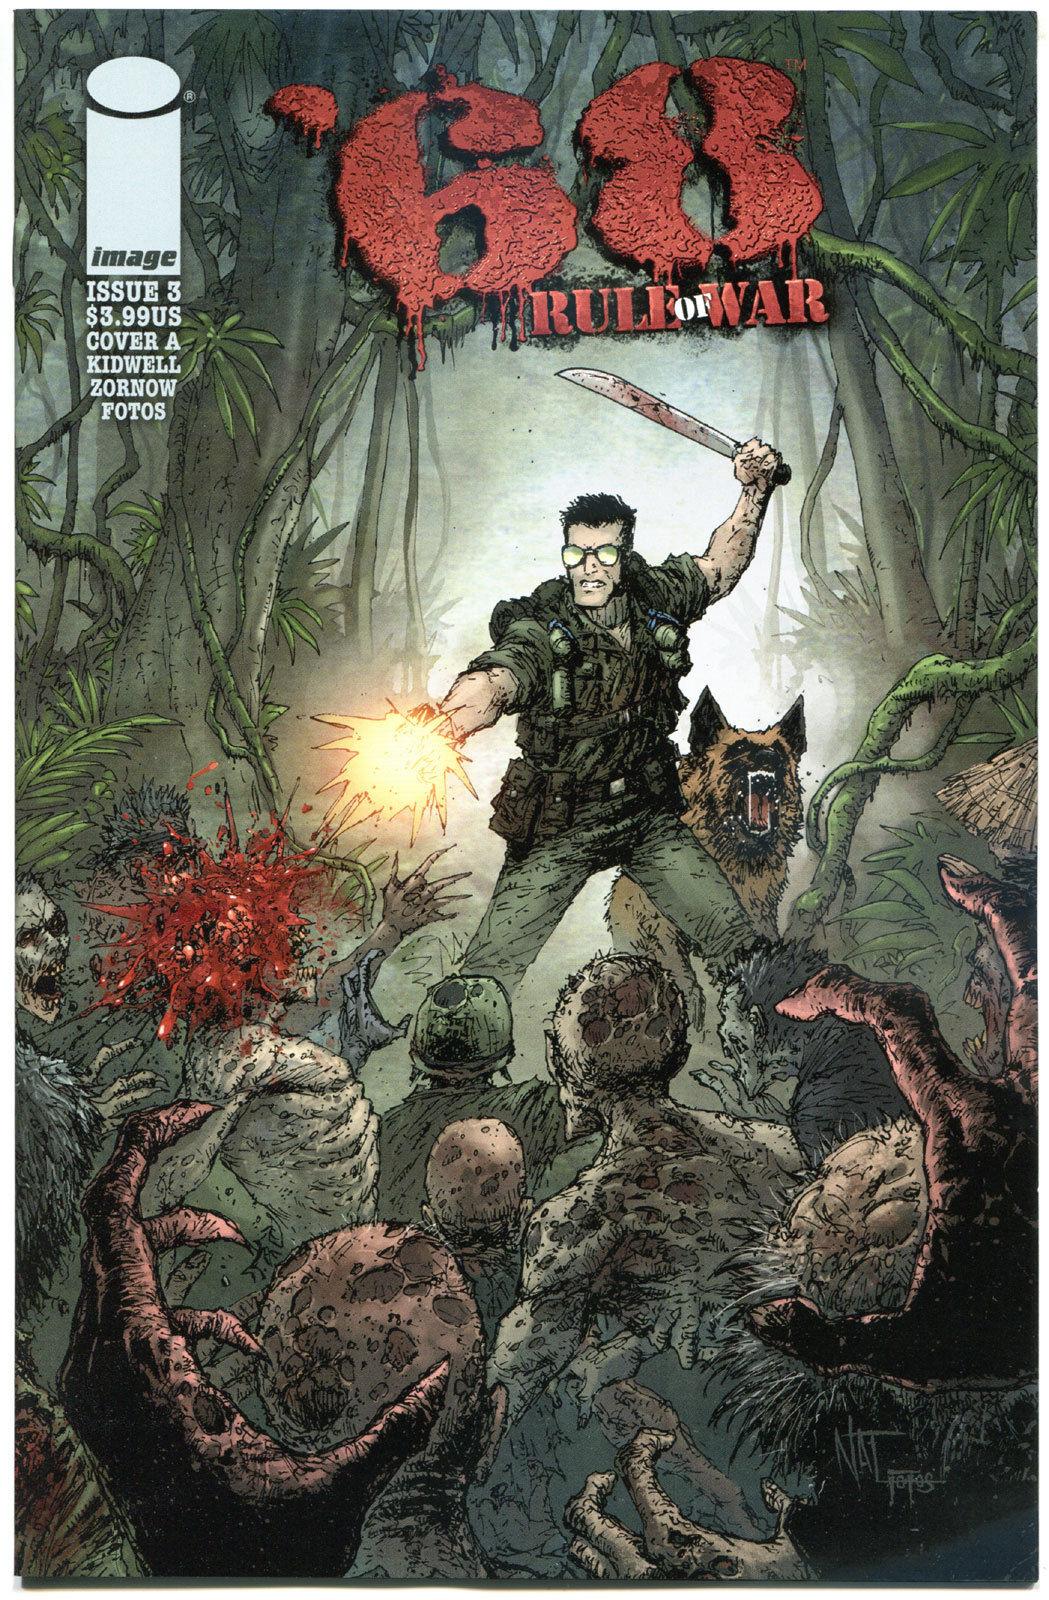 '68 RULE of WAR #3 A, NM,1st Print, Zombie, Walking Dead, 2014, more in store